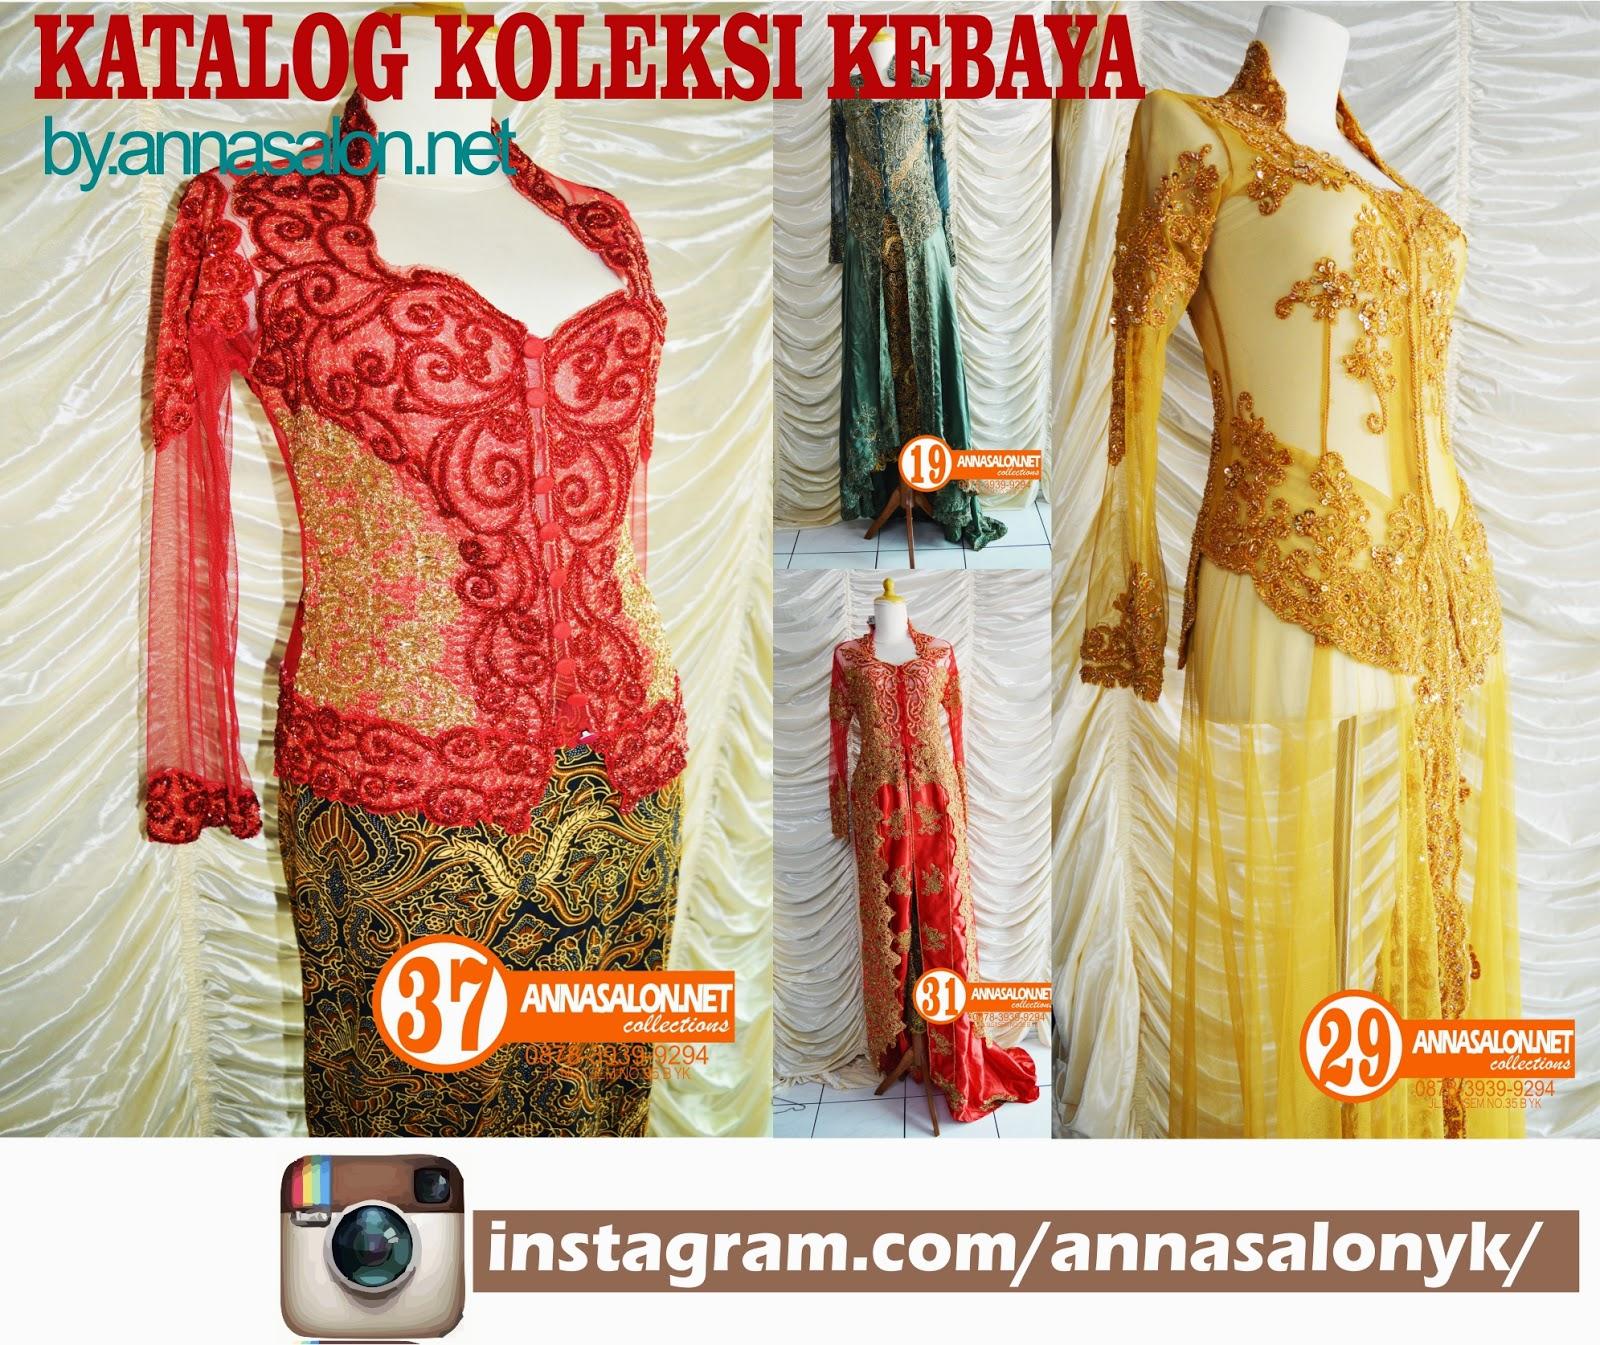 instagram.com/annasalonyk/